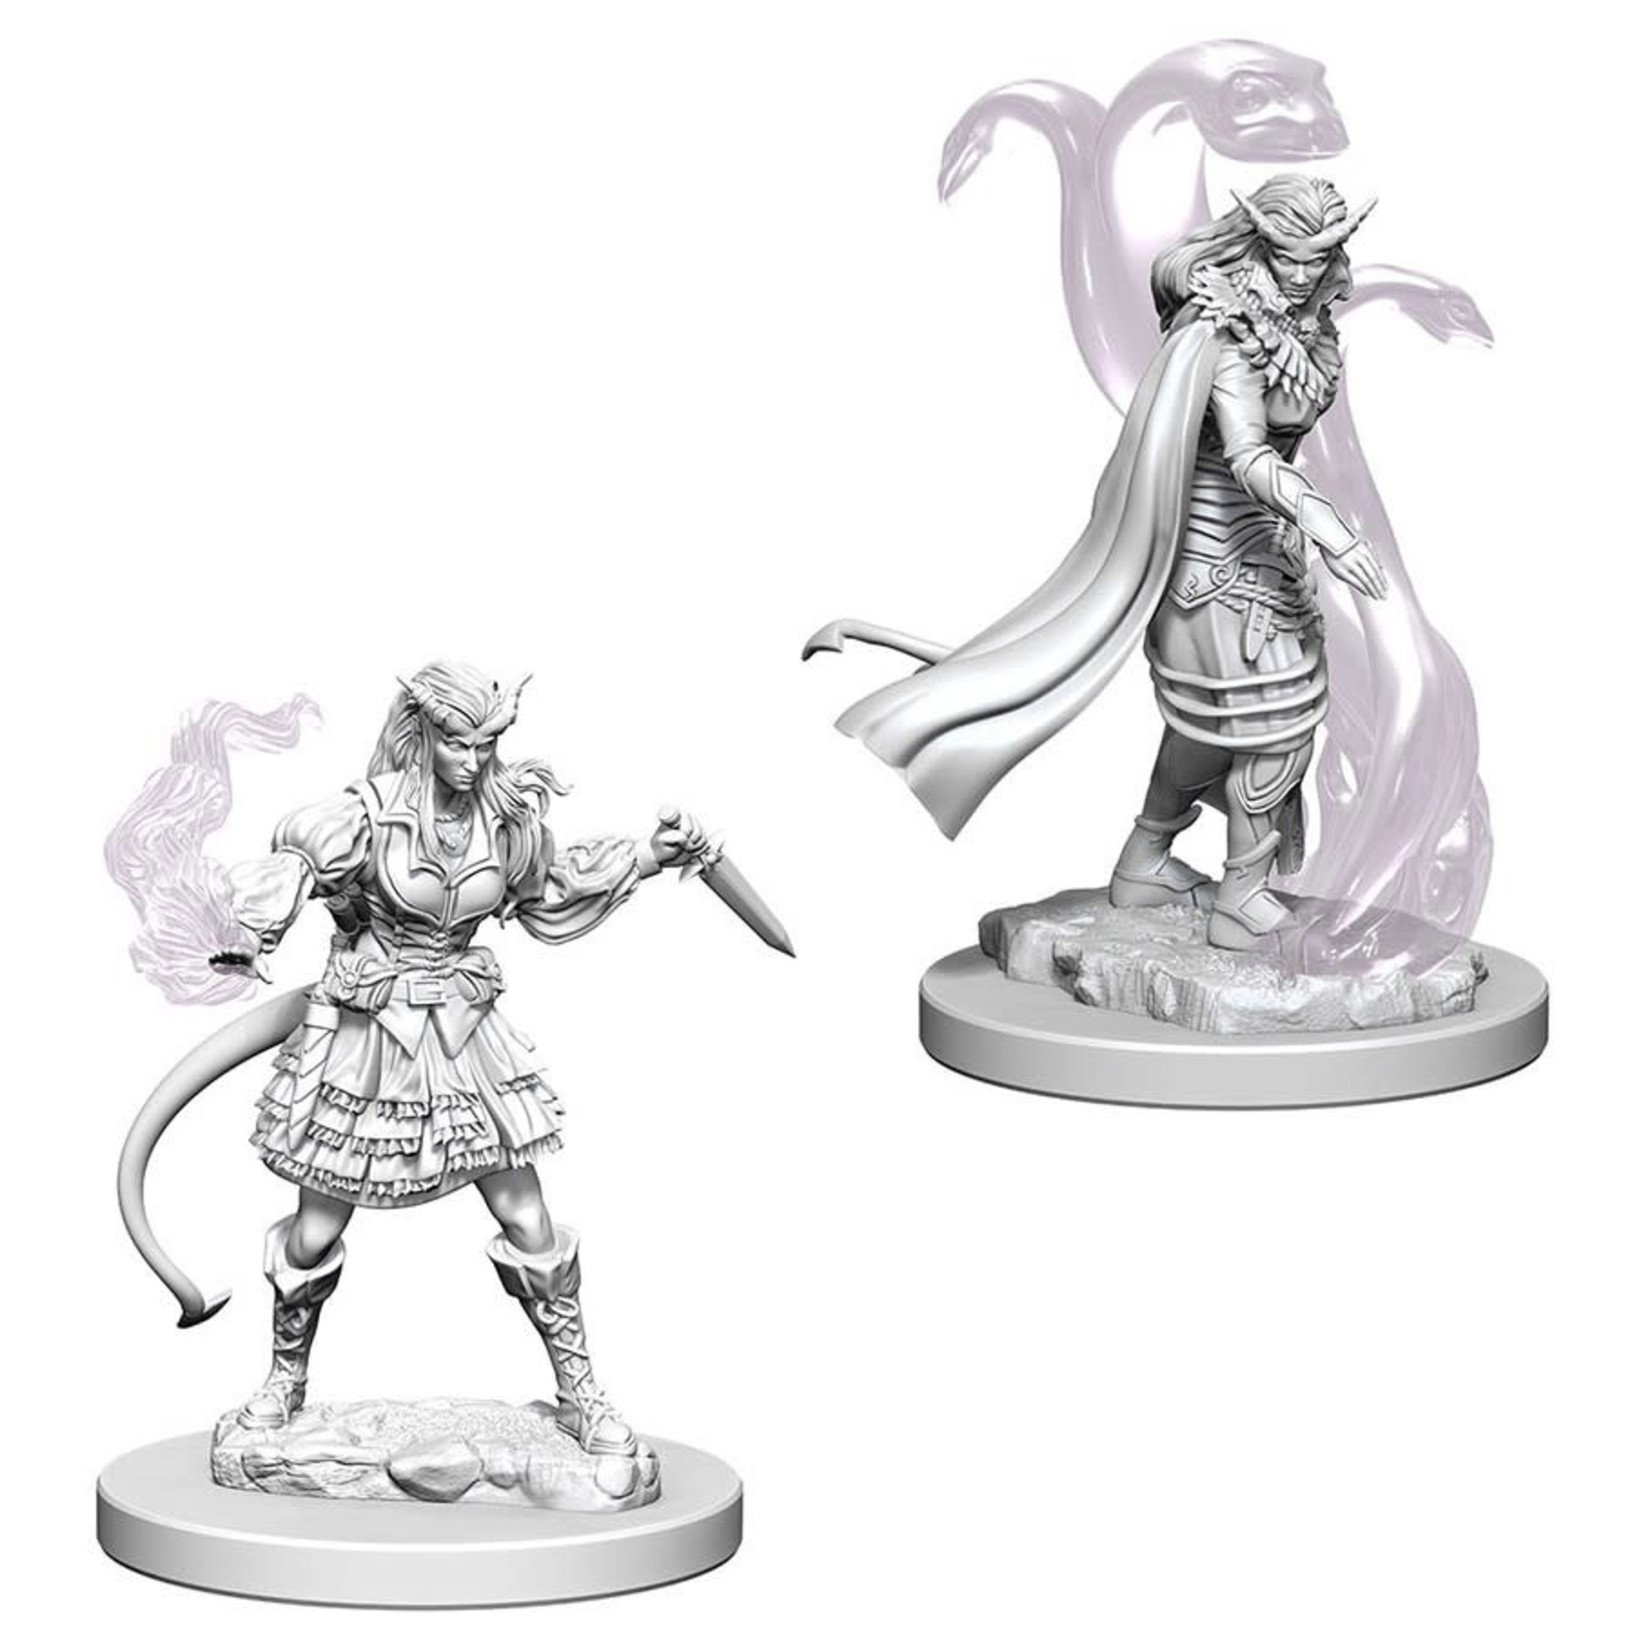 WizKids D&D Minis (unpainted): Tiefling Sorcerer (female) Wave 4, 73202